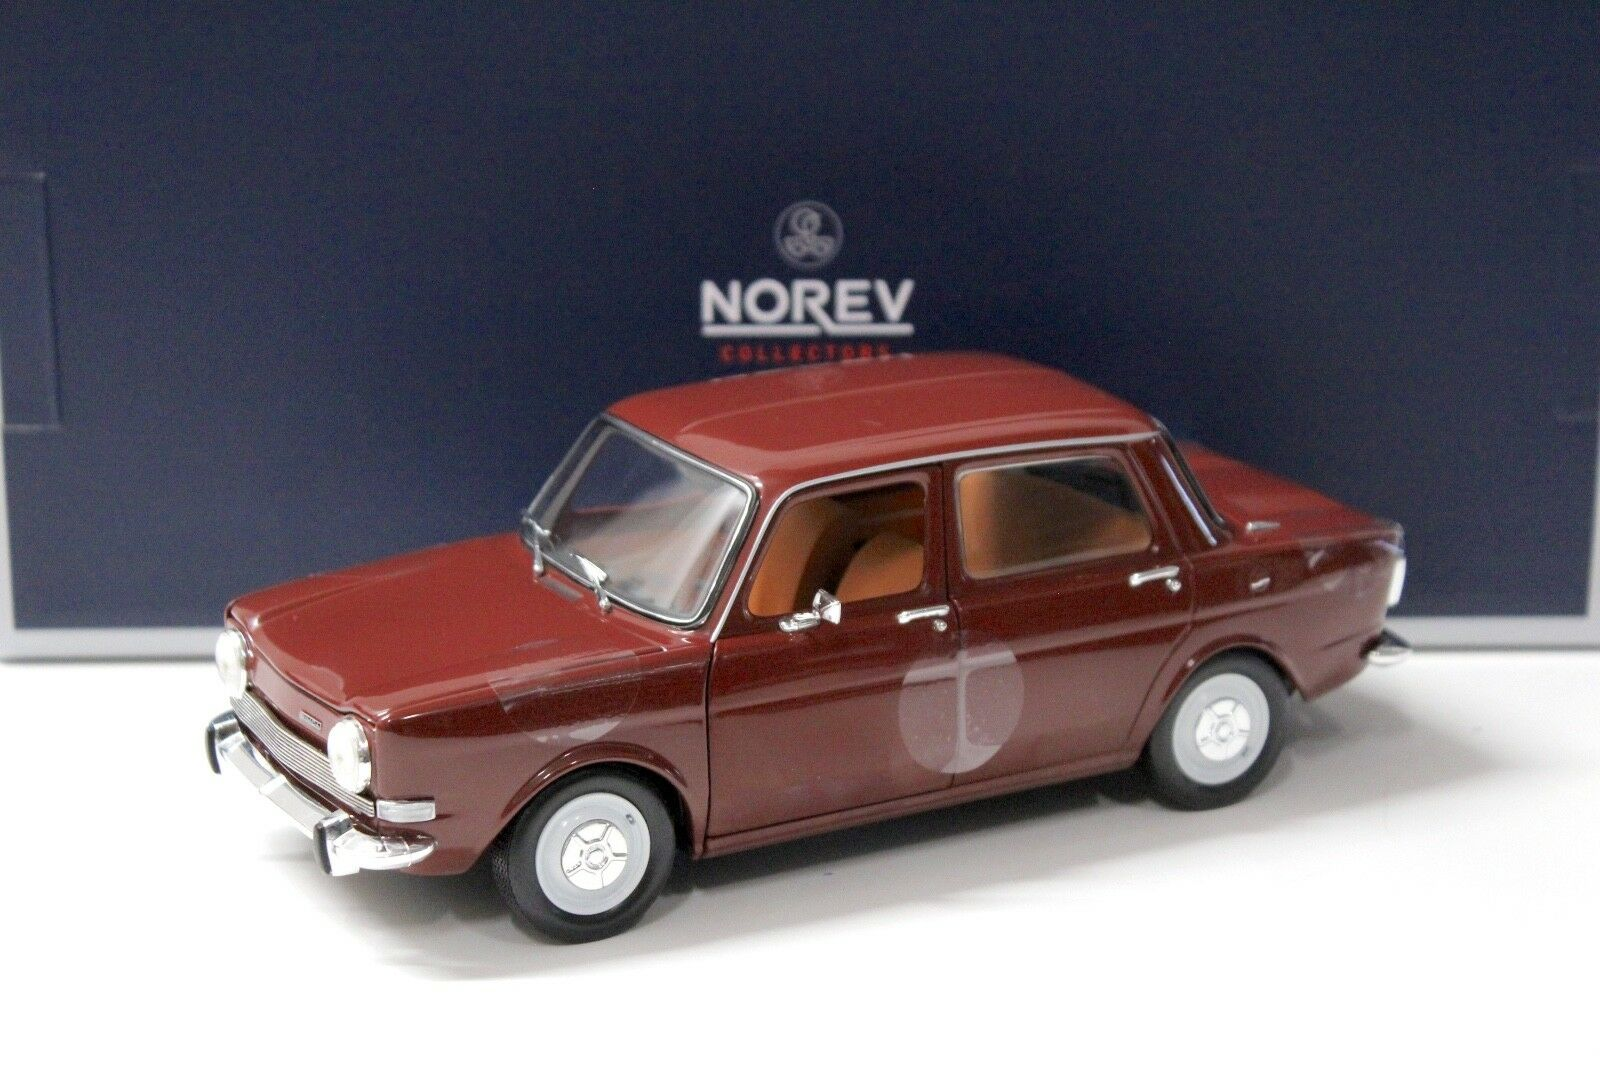 1 18 Norev Simca 1000 LS 1974 Amarante red red red NEW bei PREMIUM-MODELCARS 5ca3d3